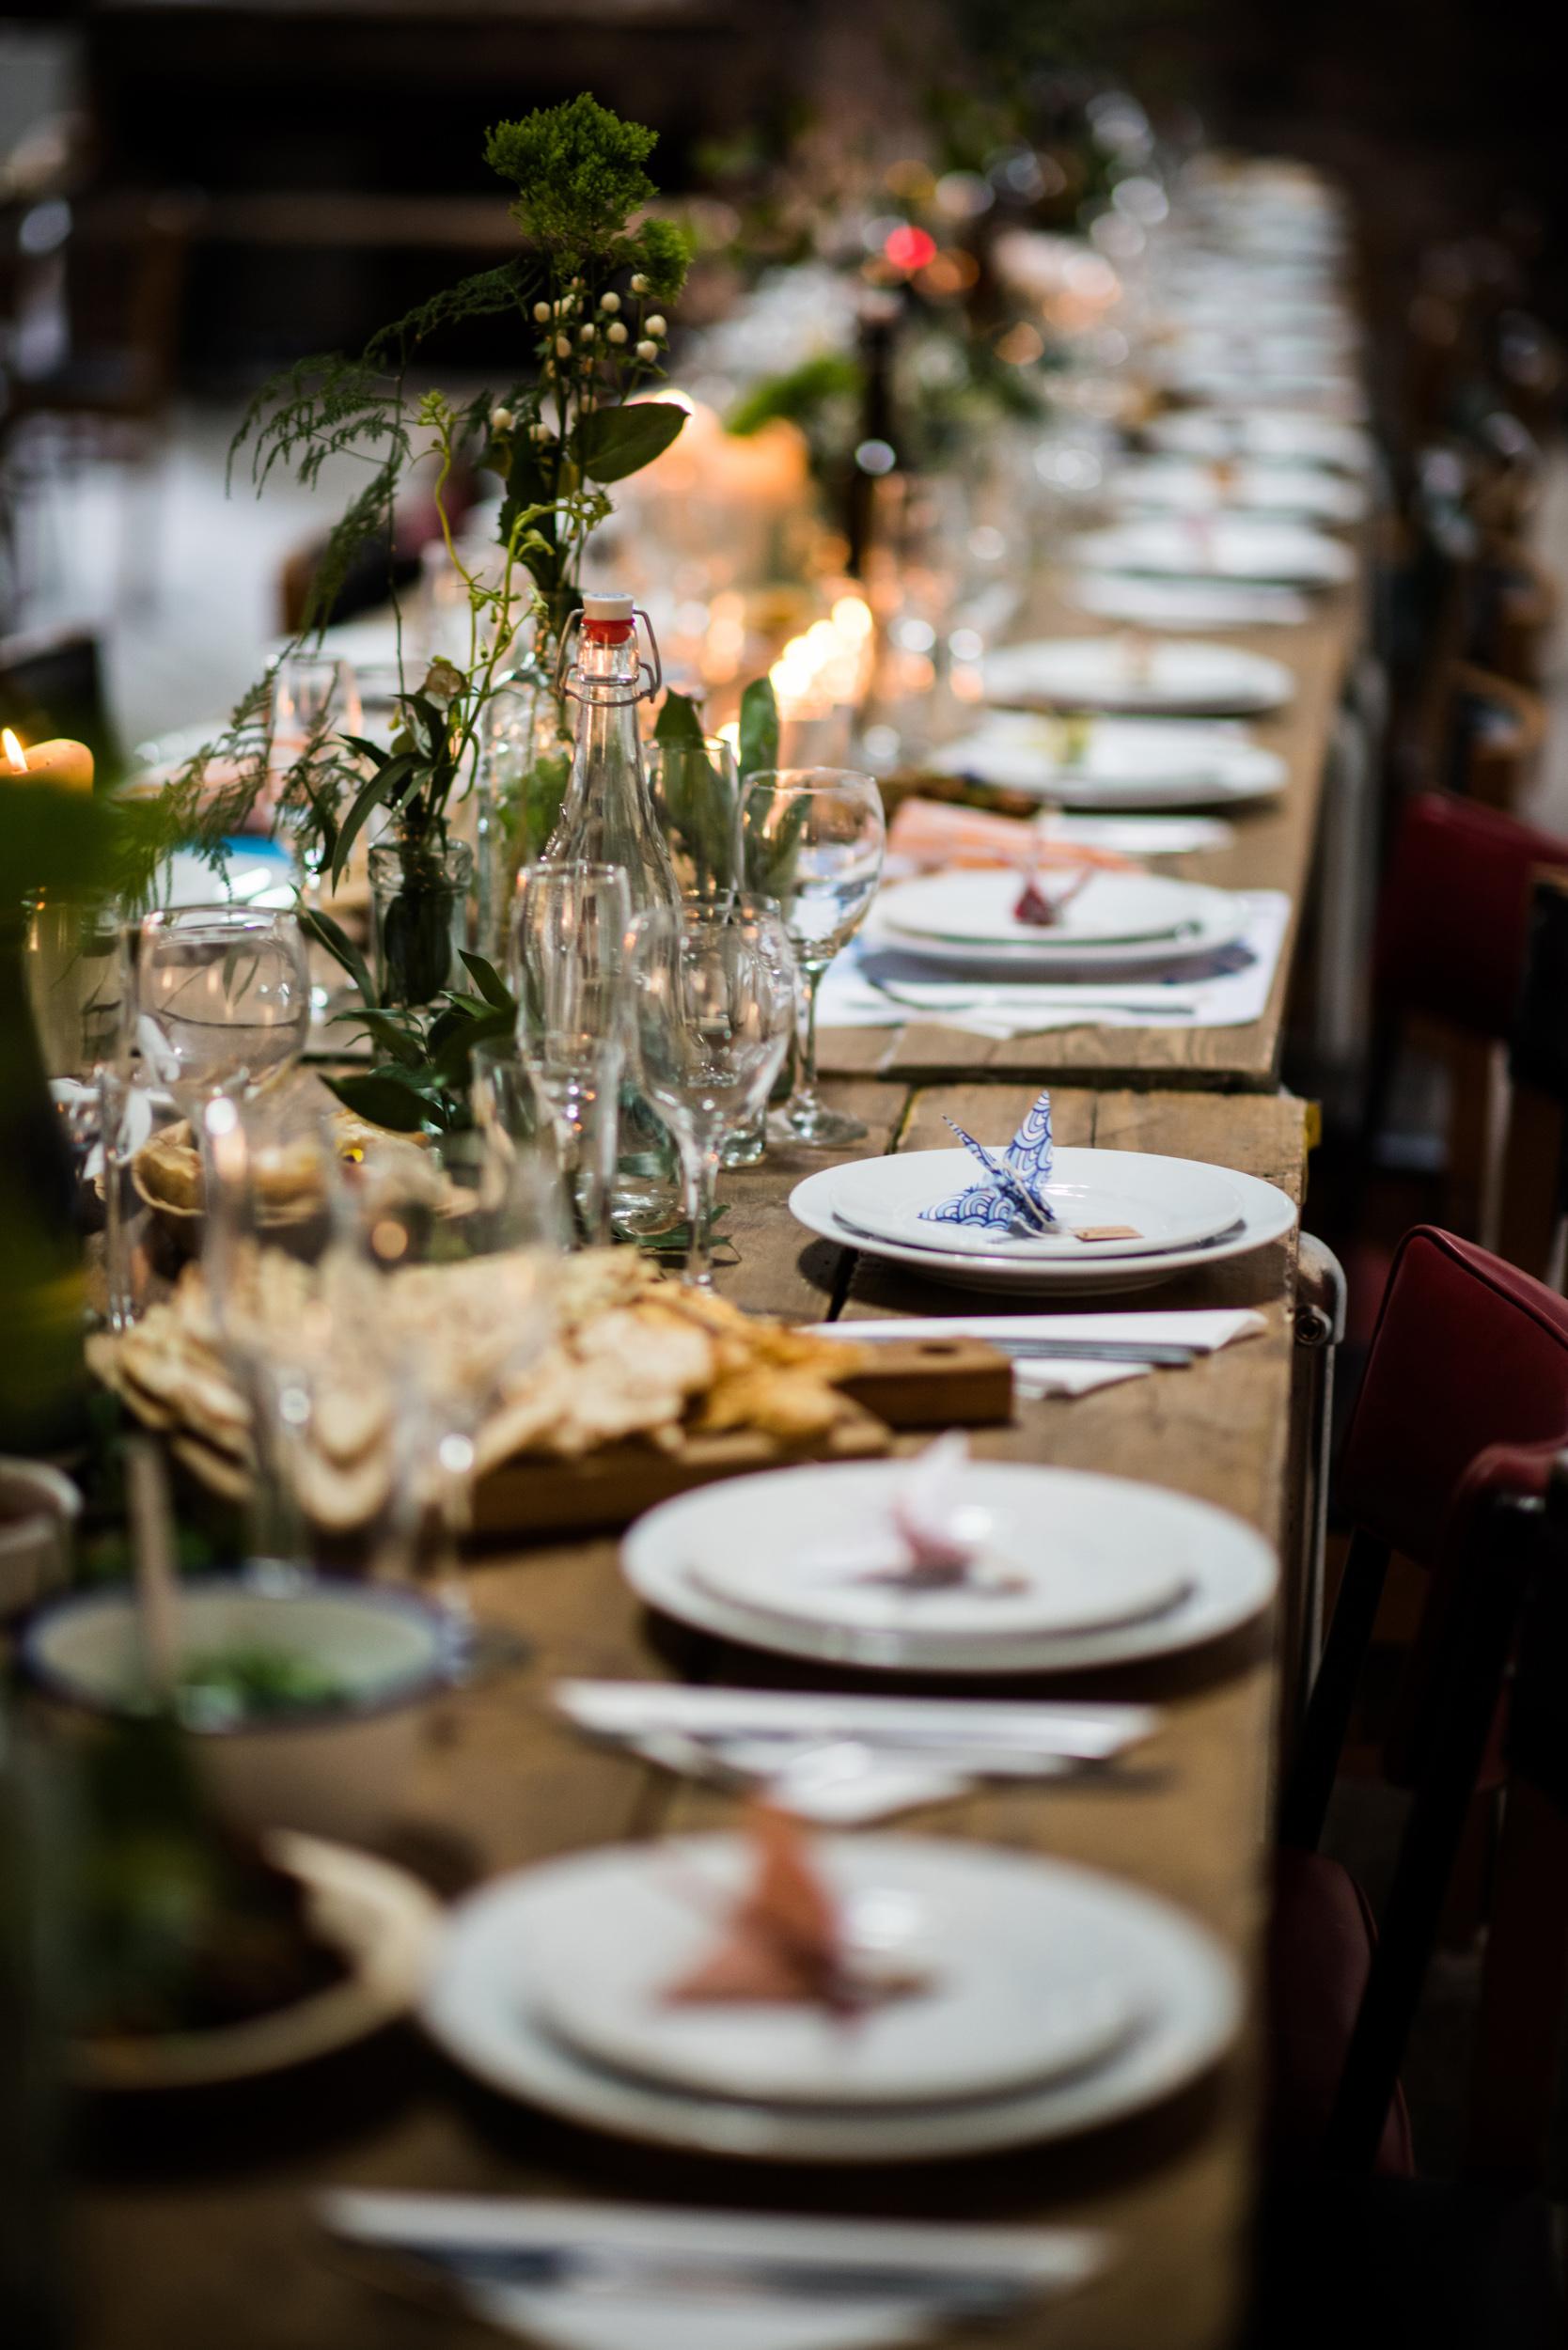 Jill-Kate-Beaumont-Lace-Sheffield-Wedding-19.jpg